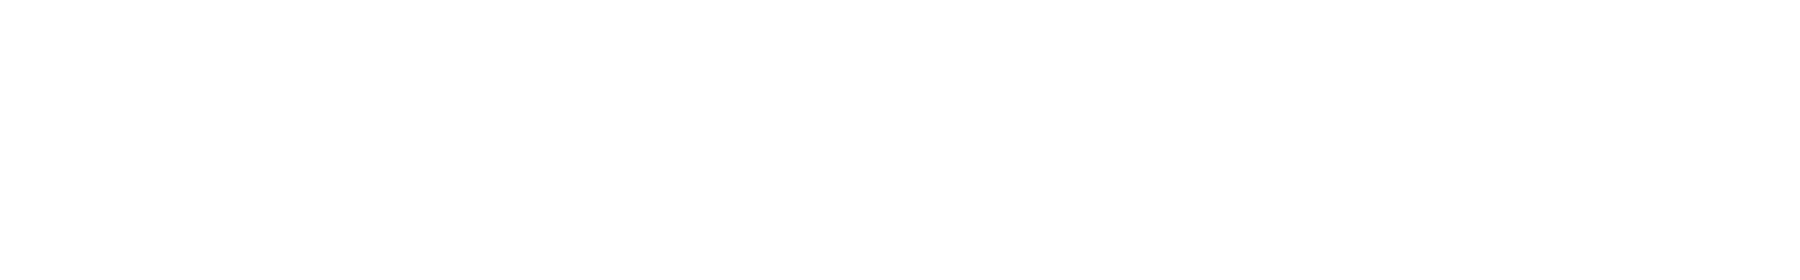 169880 bassguitar 120bpm loop1 c wav